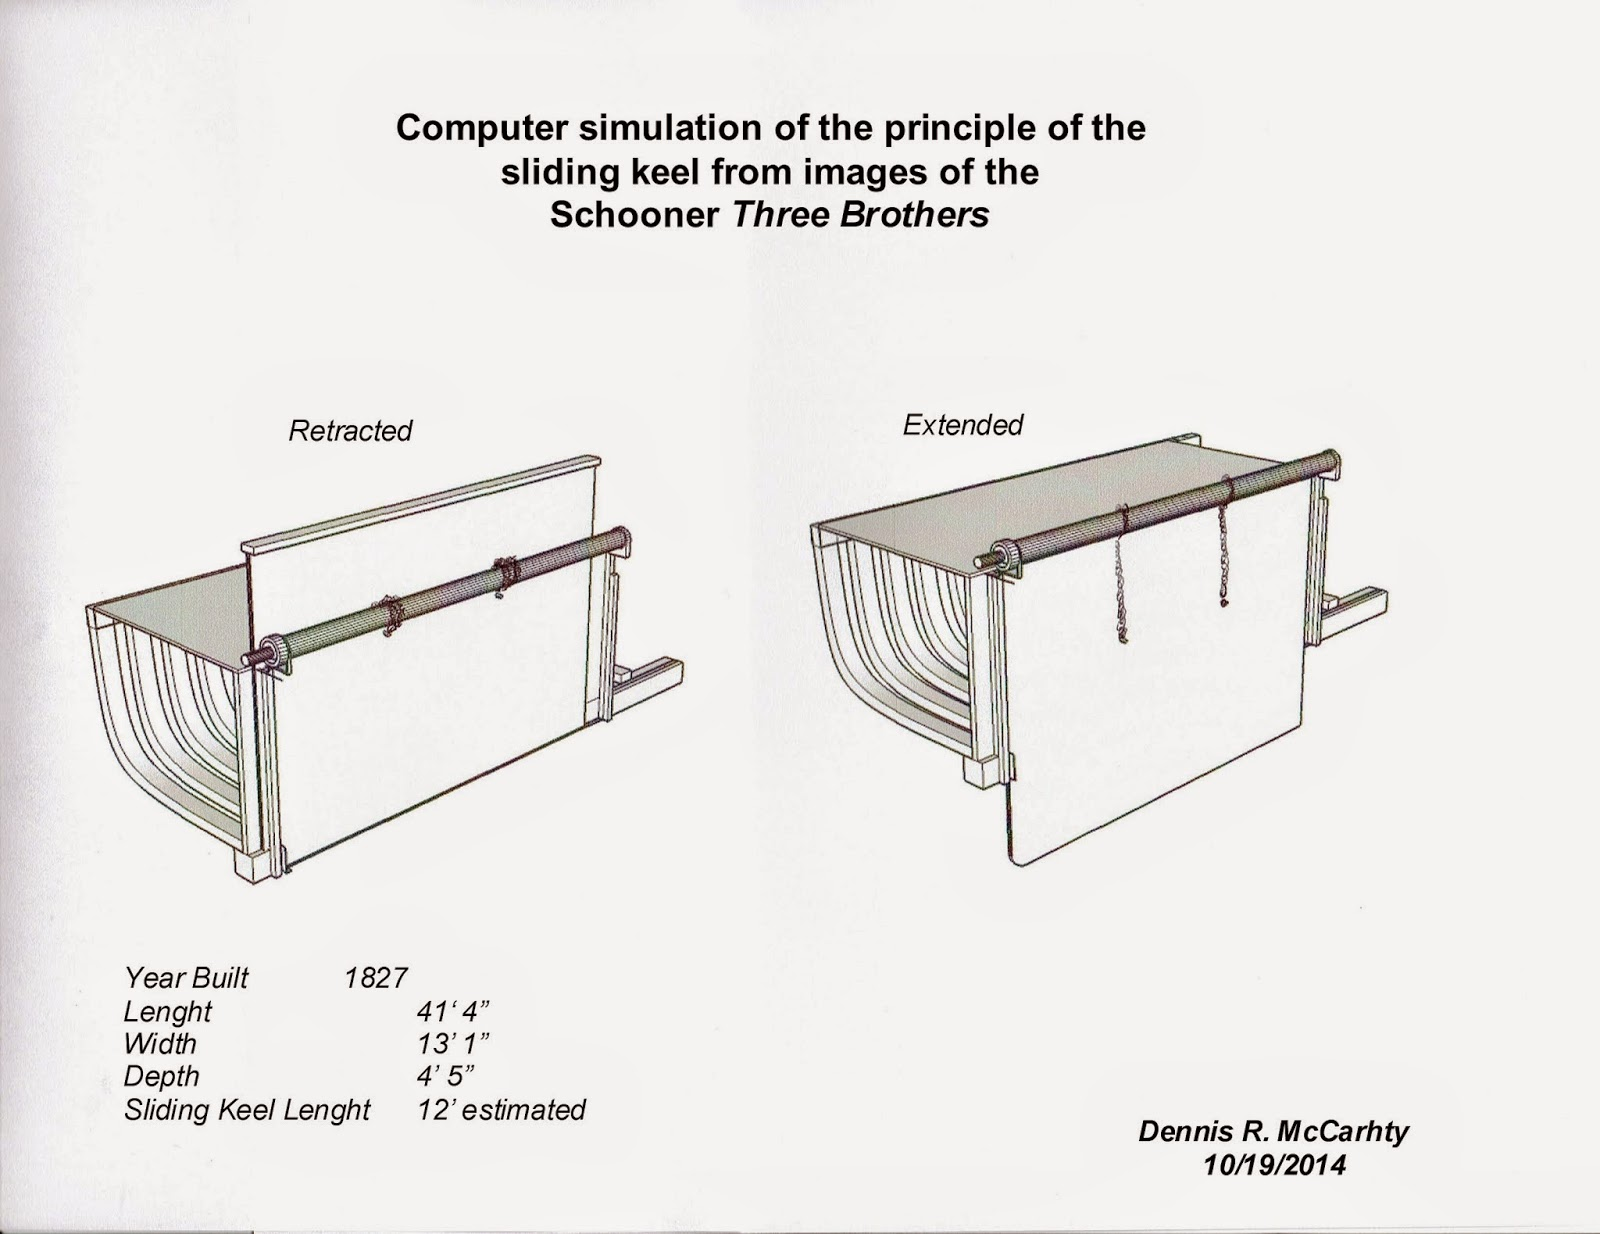 http://www.shipwreckworld.com/articles/early-1800s-daggerboard-schooner